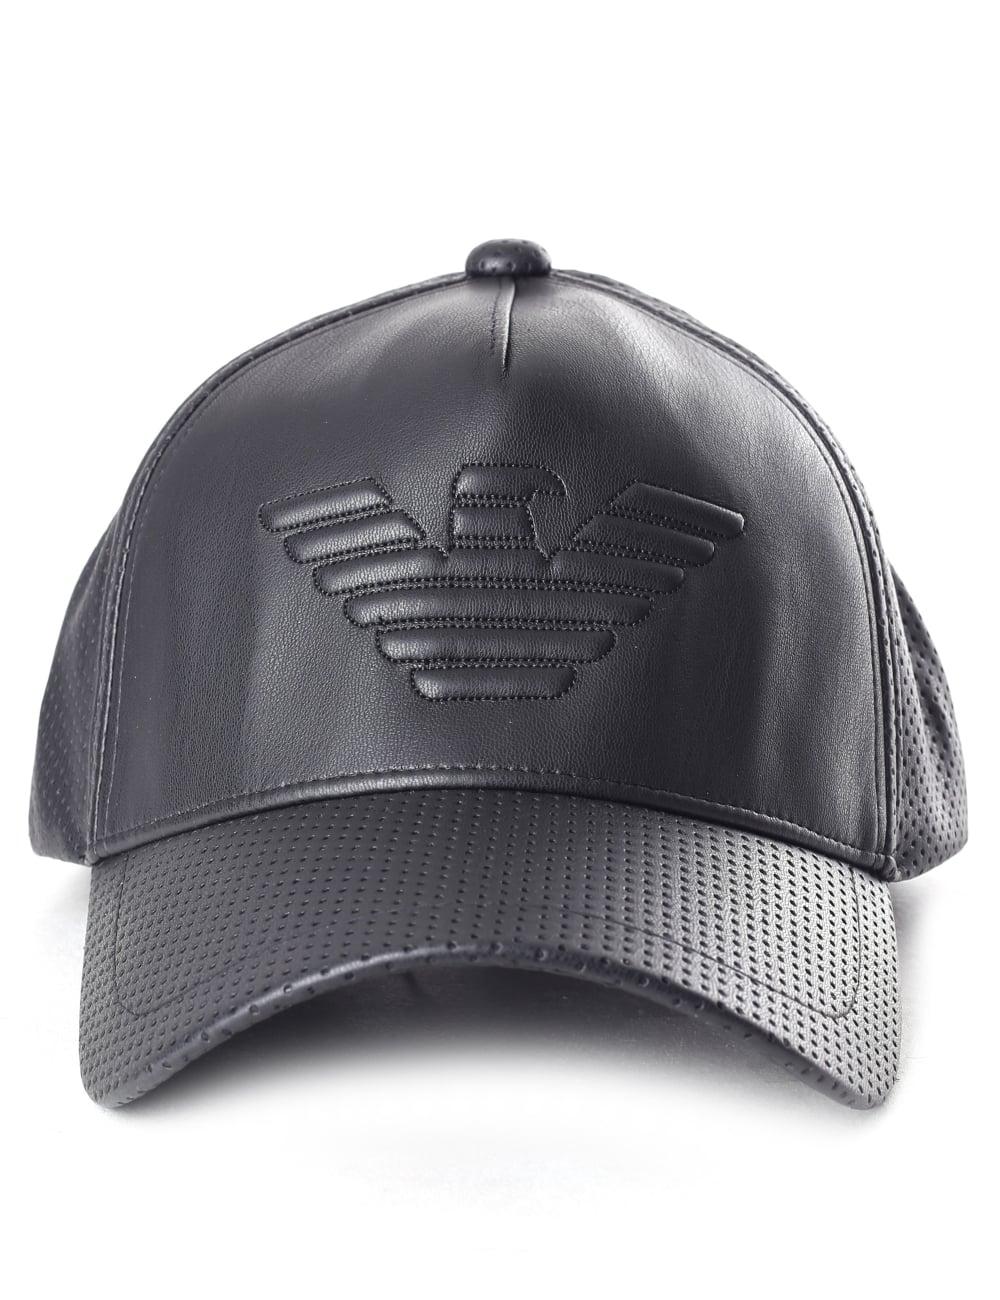 70d33bfee820a Emporio Armani Men s Perforated Logo Baseball Cap